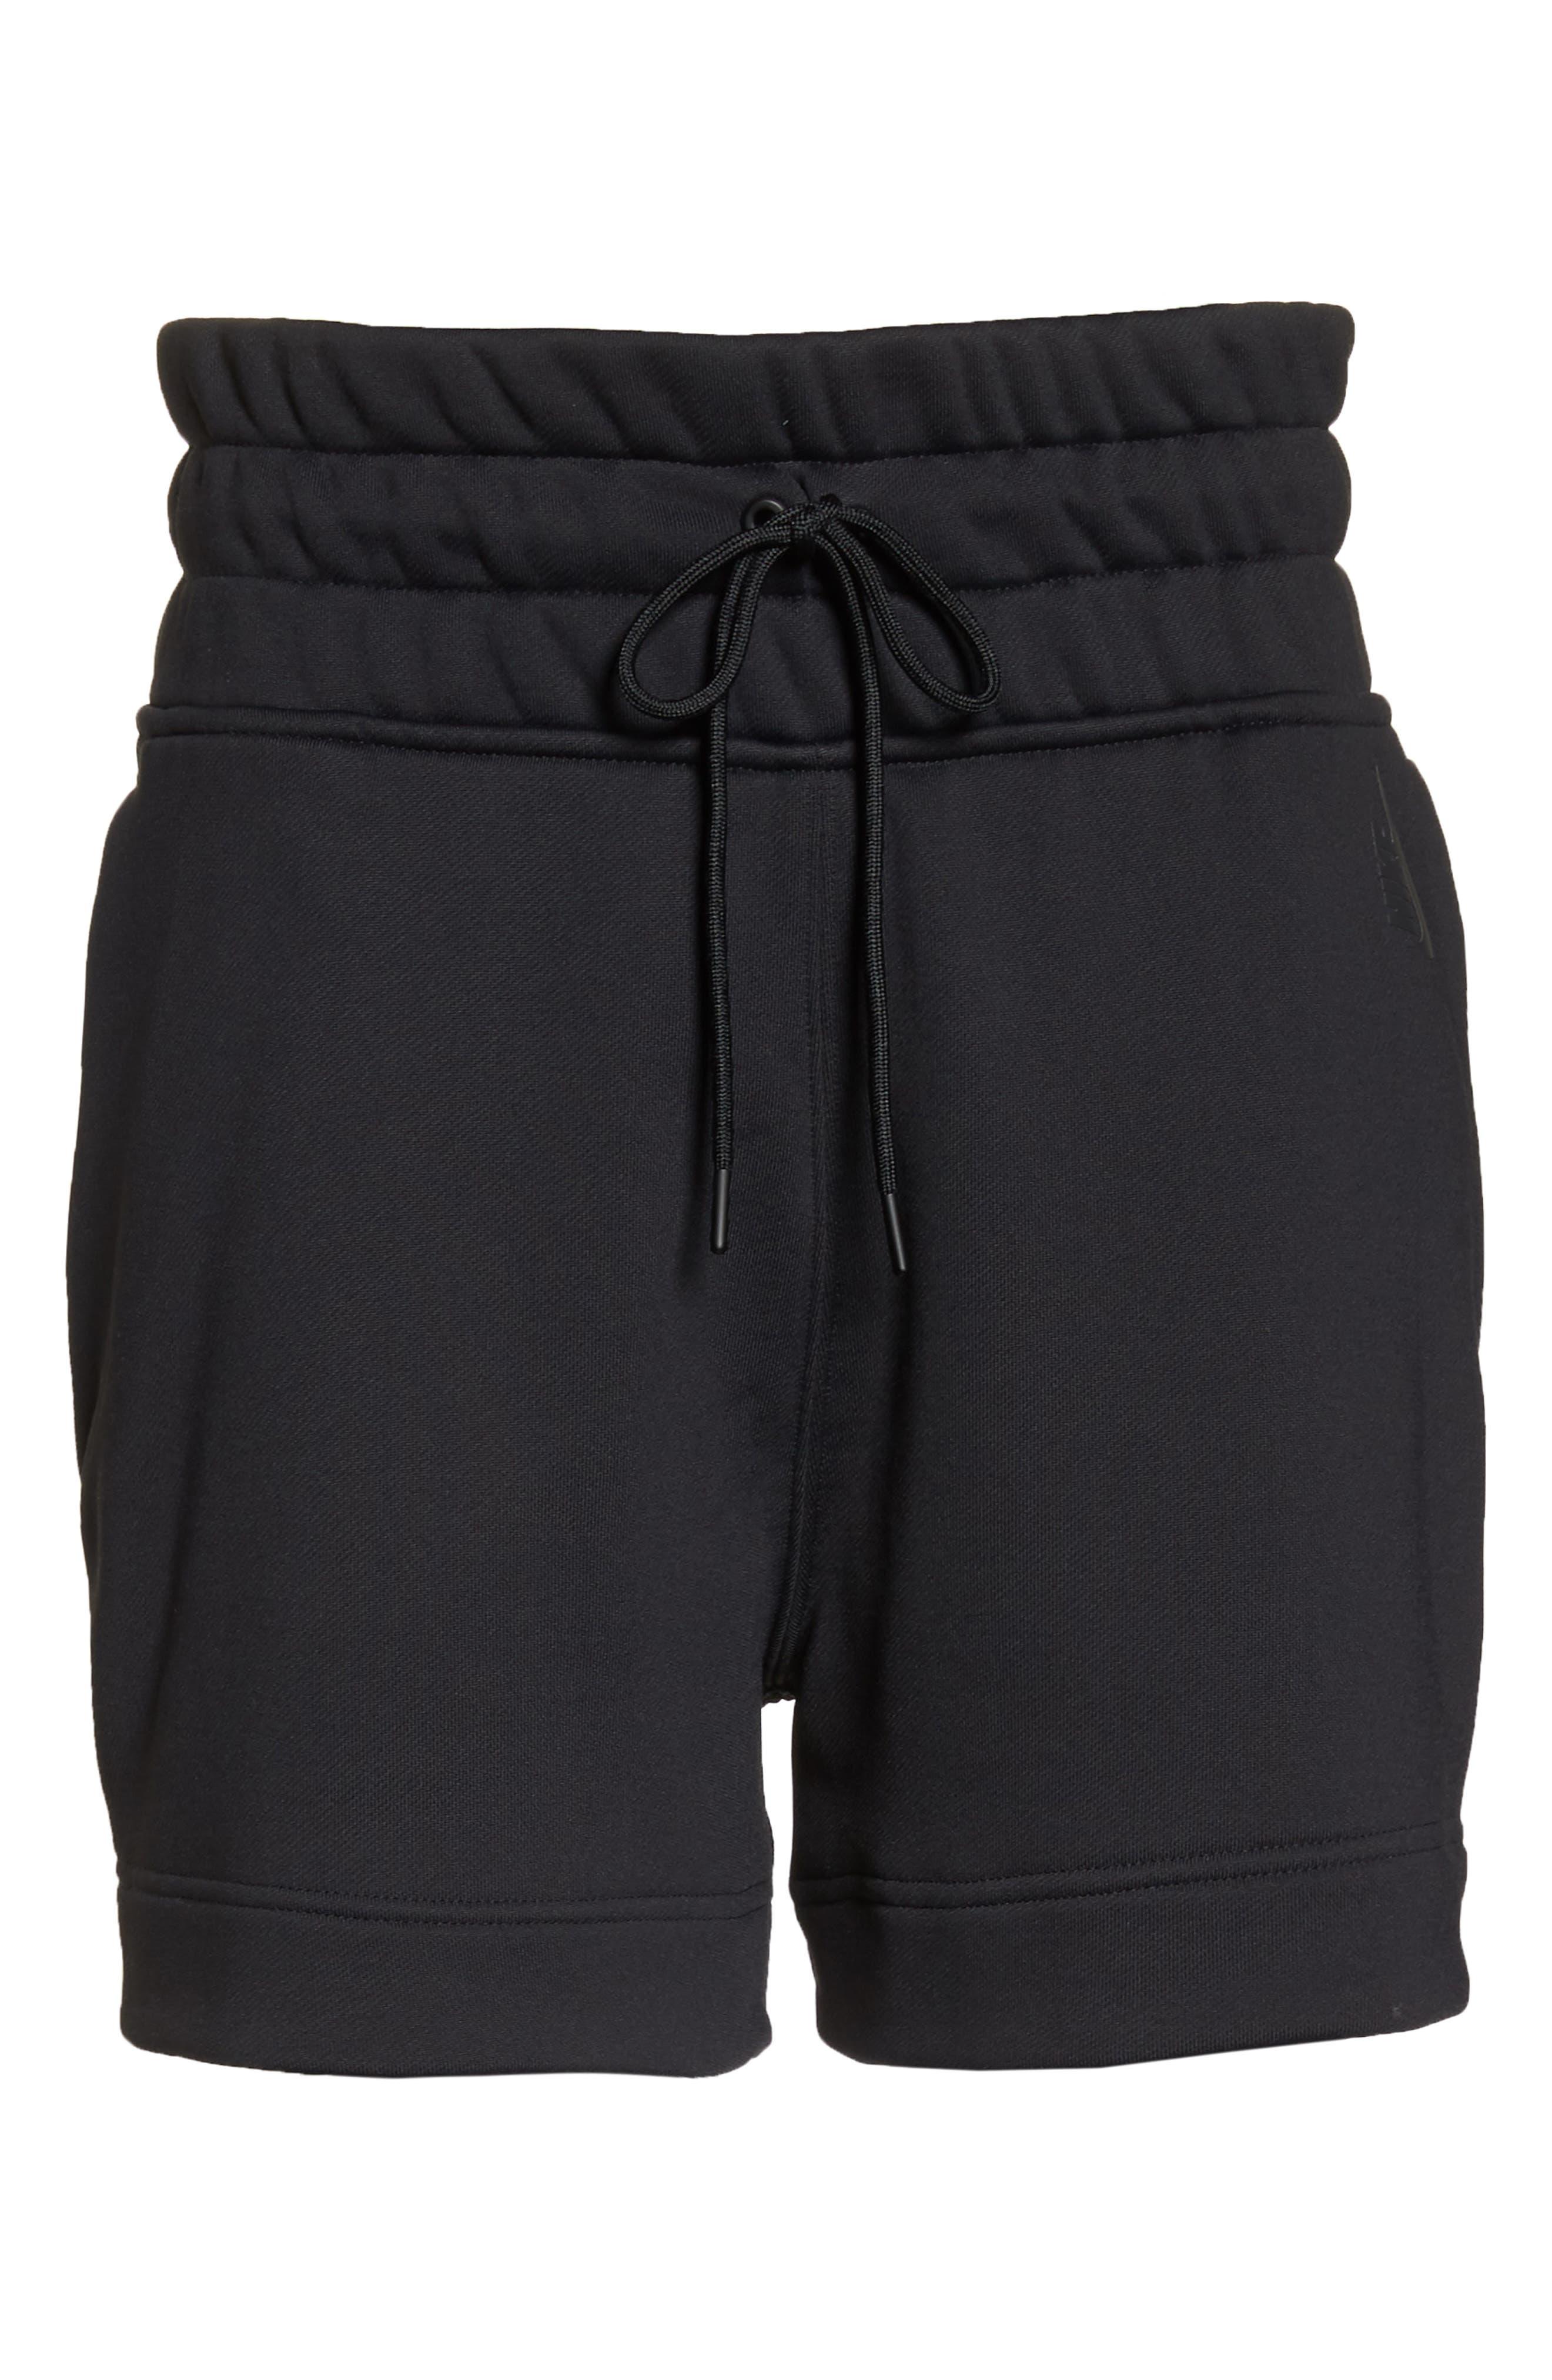 NikeLab Collection Women's Fleece Shorts,                             Alternate thumbnail 7, color,                             BLACK/ BLACK